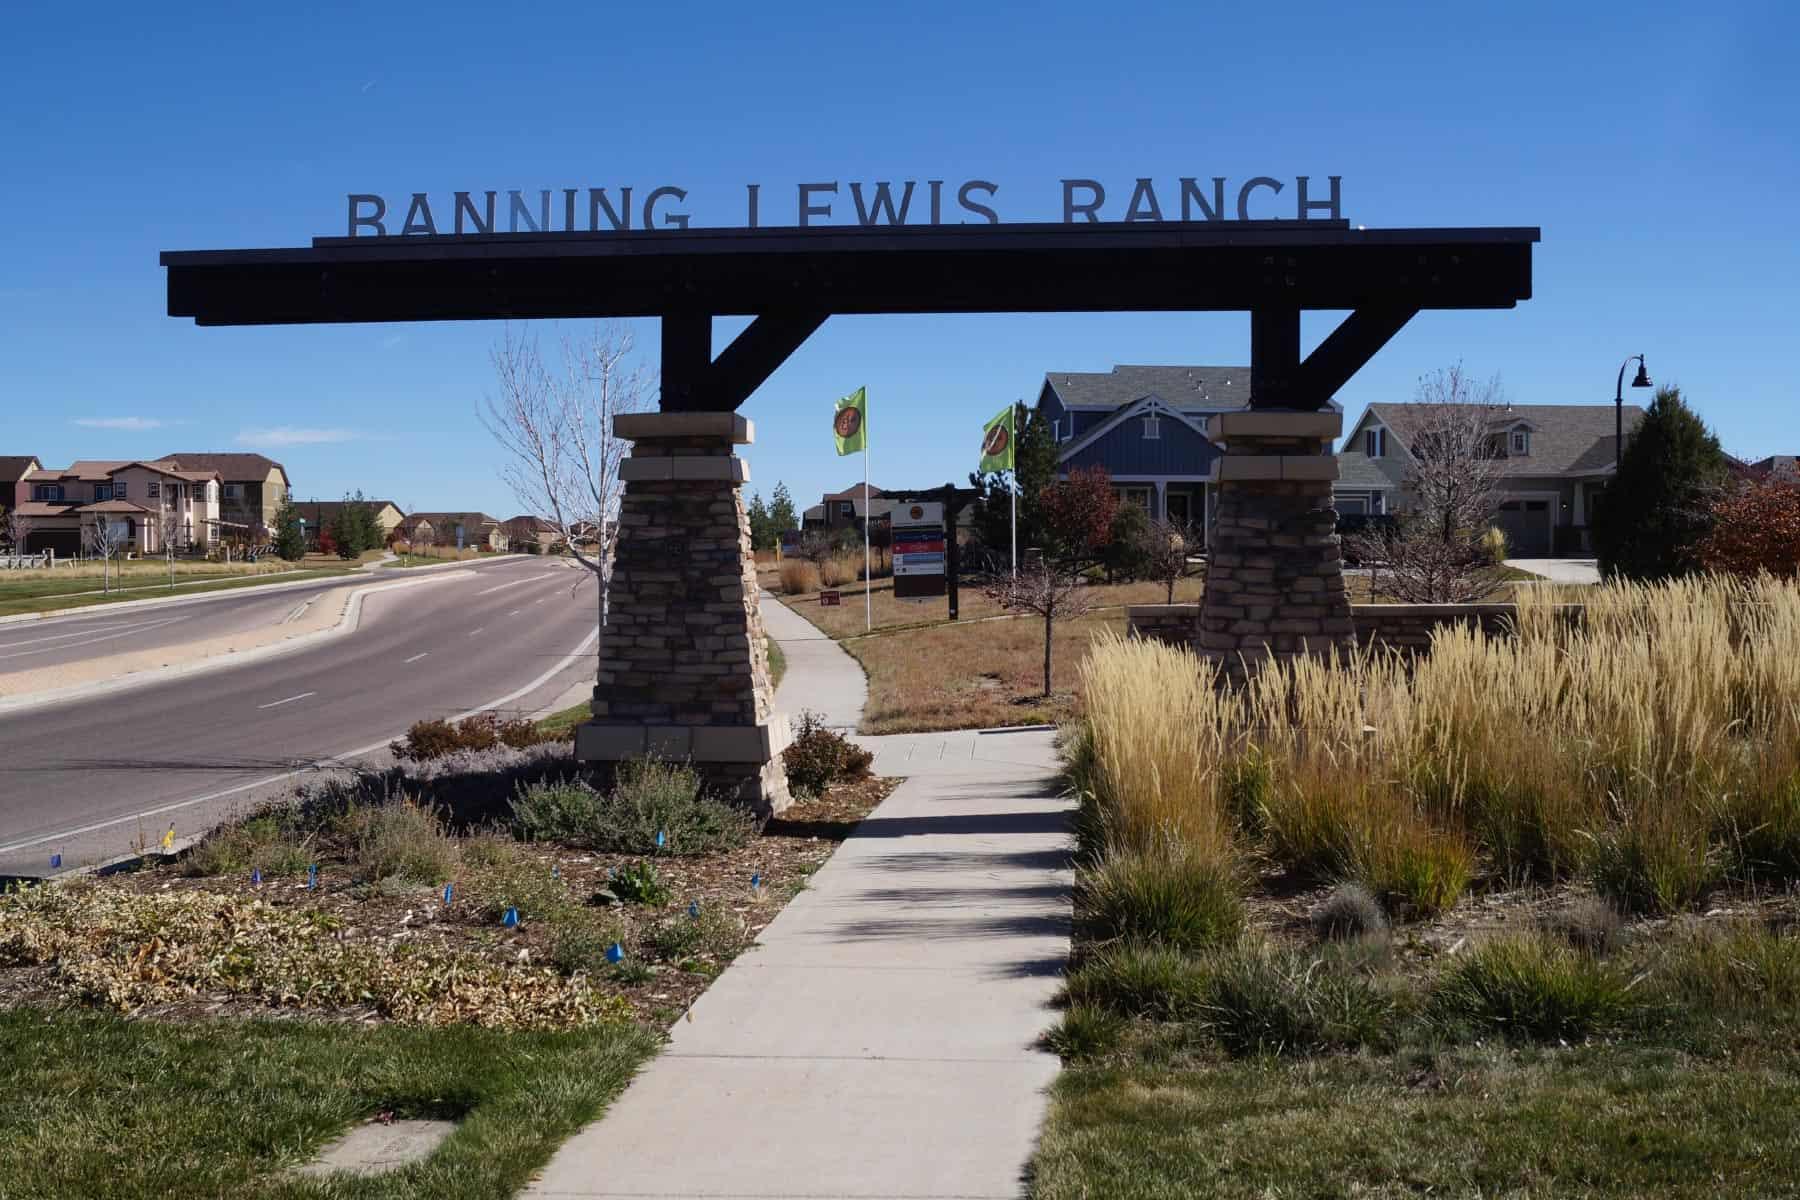 Banning Lewis Ranch Marketing